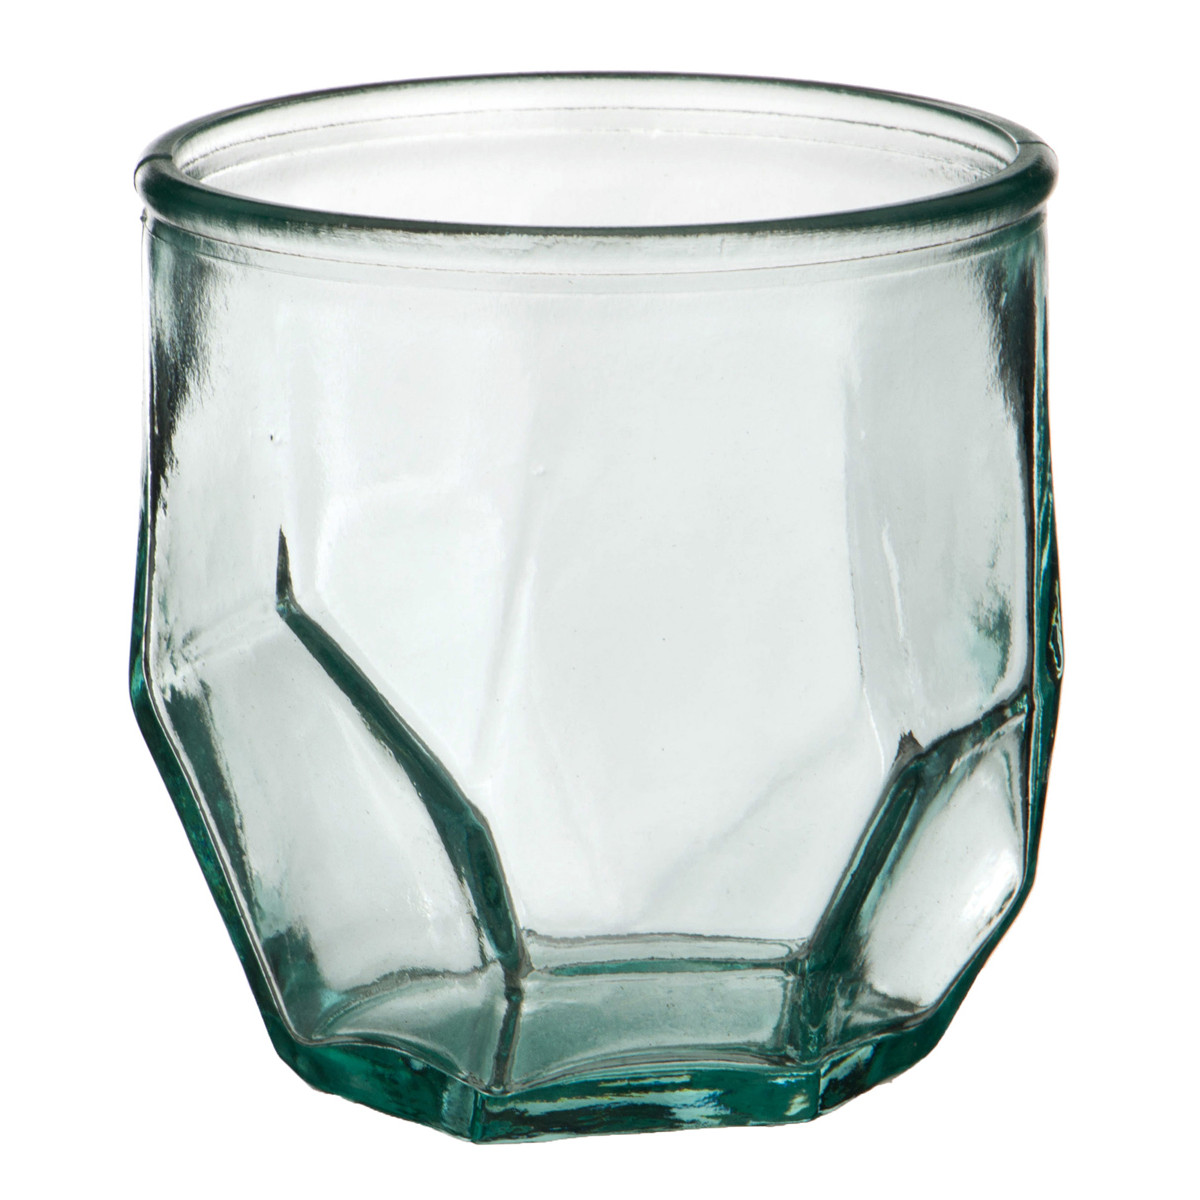 {} San Miguel Ваза Bala (9 см) ваза керамическая 14 х 9 х 30 см